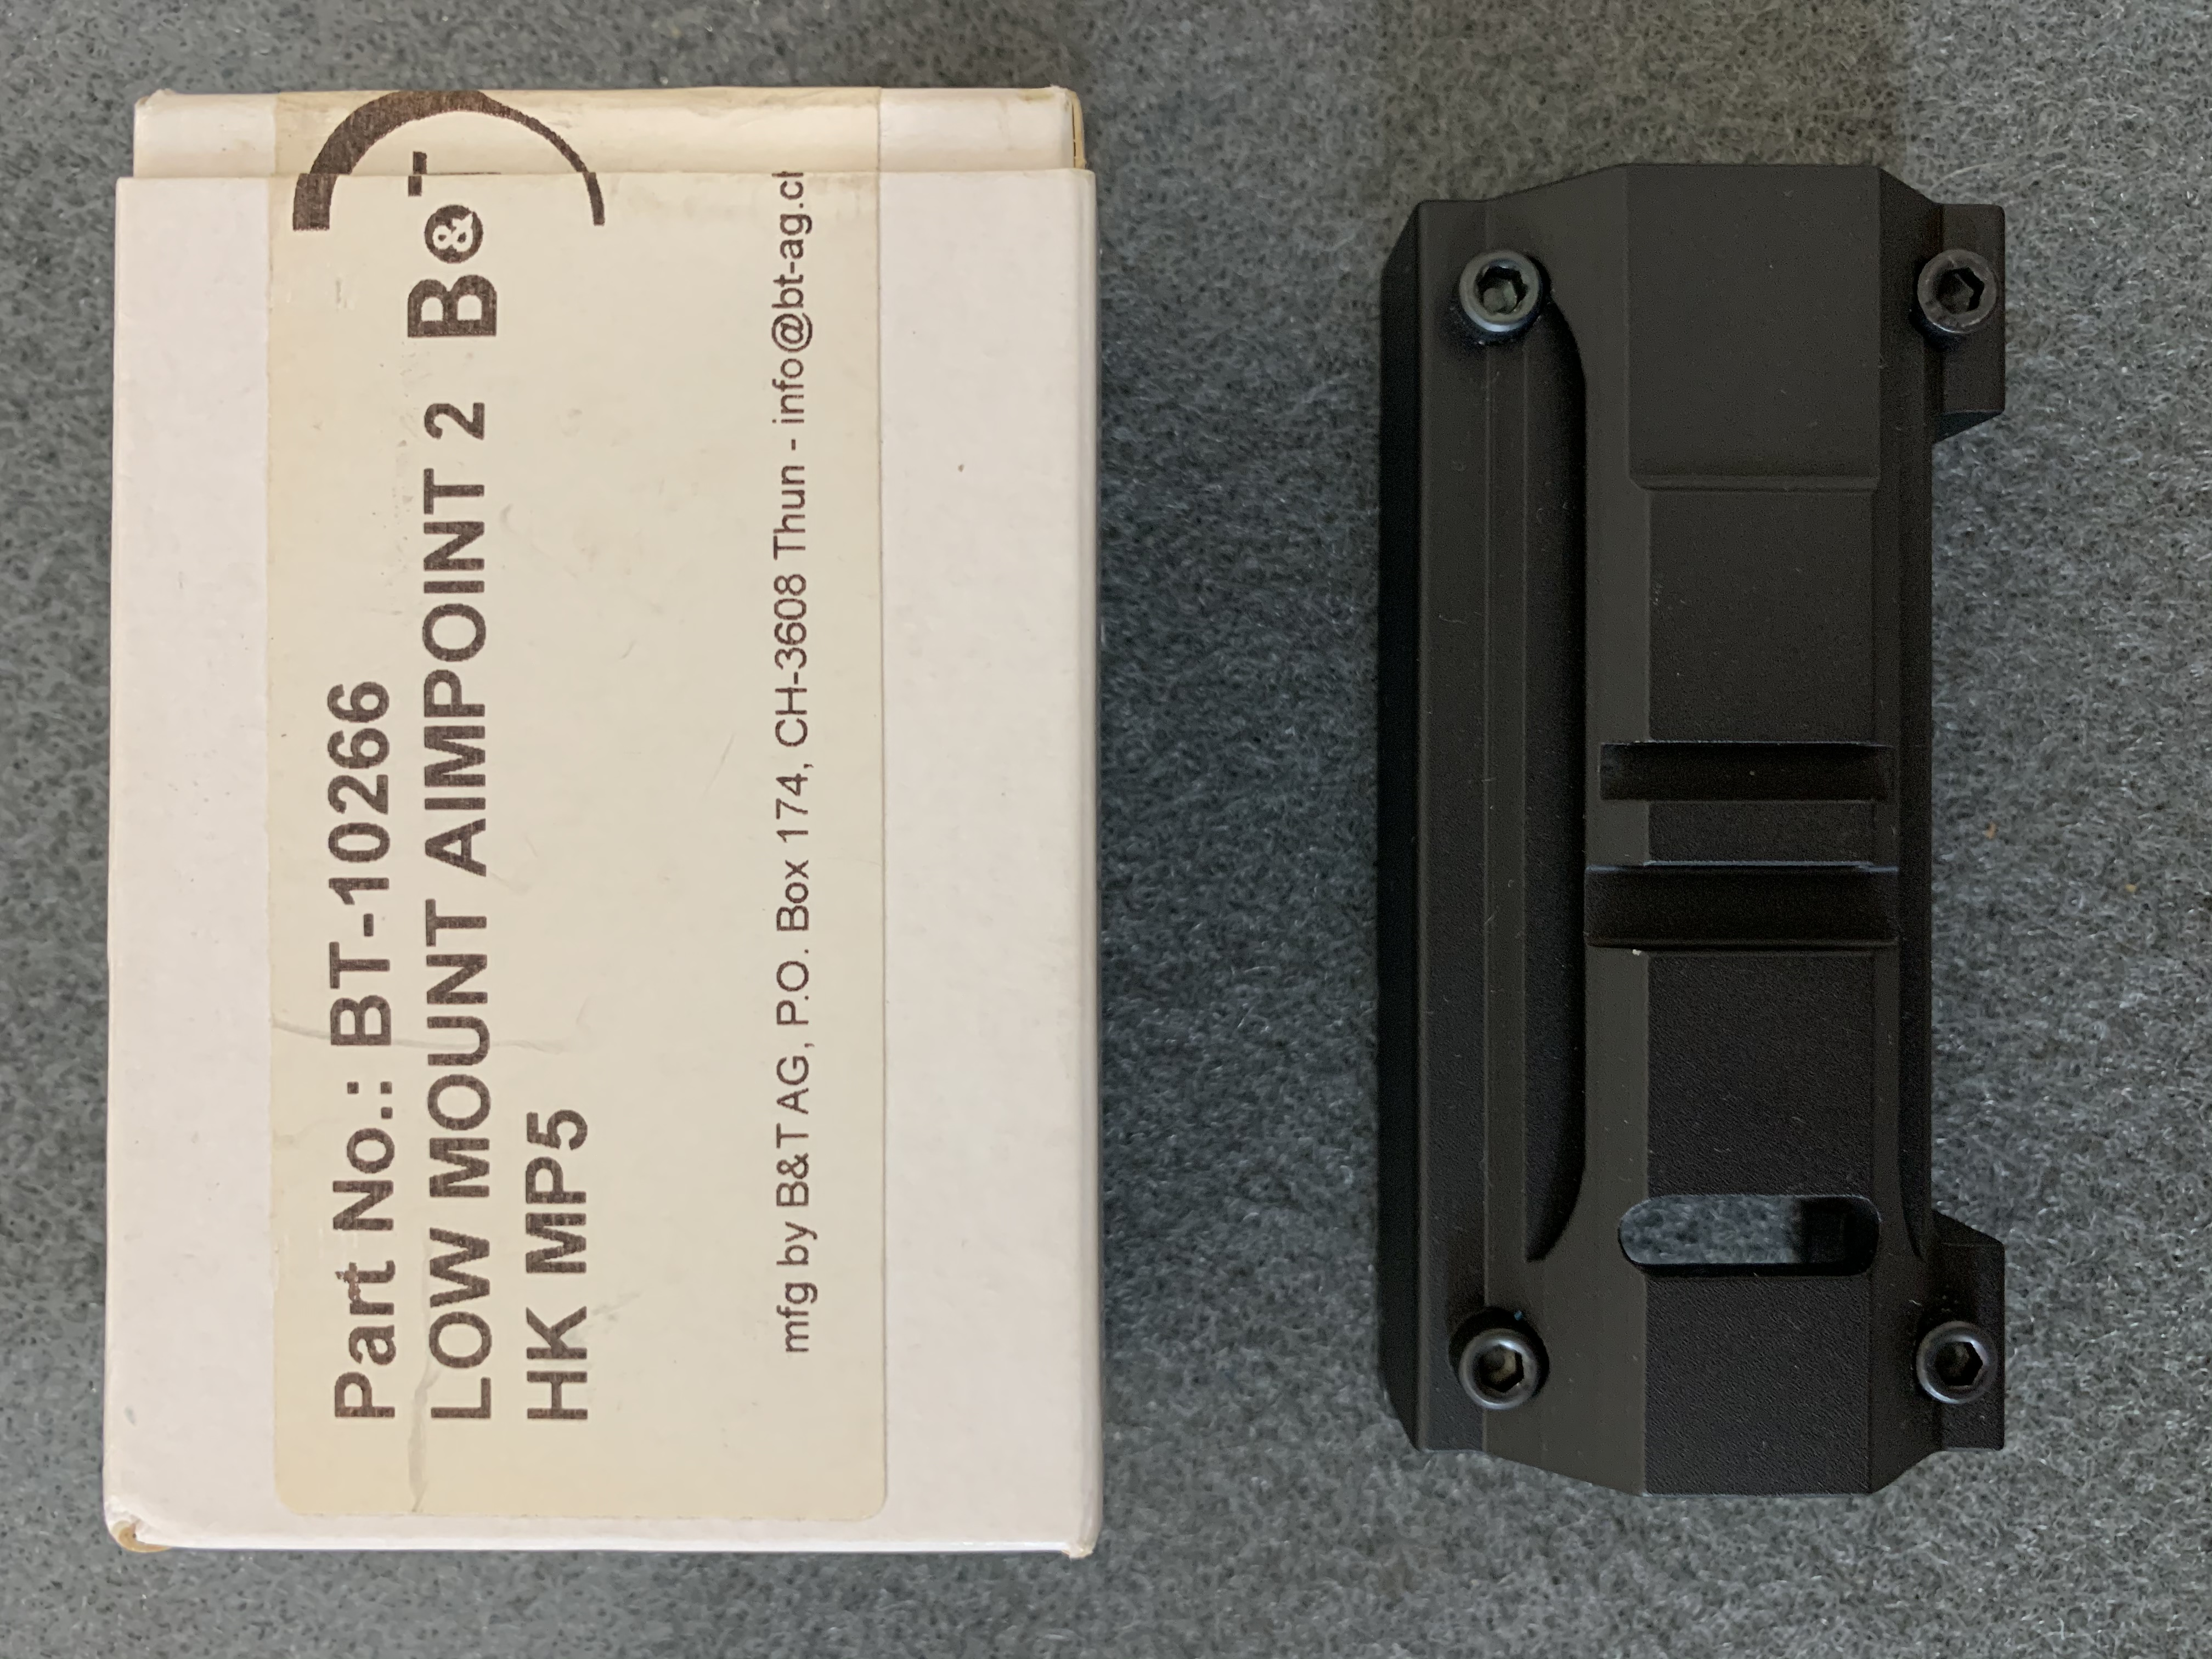 WTS: B&T 10266 Low Mount for Aimpoint, etc-2049fb2e-6a33-438a-8e71-f5e0761c953a.jpeg